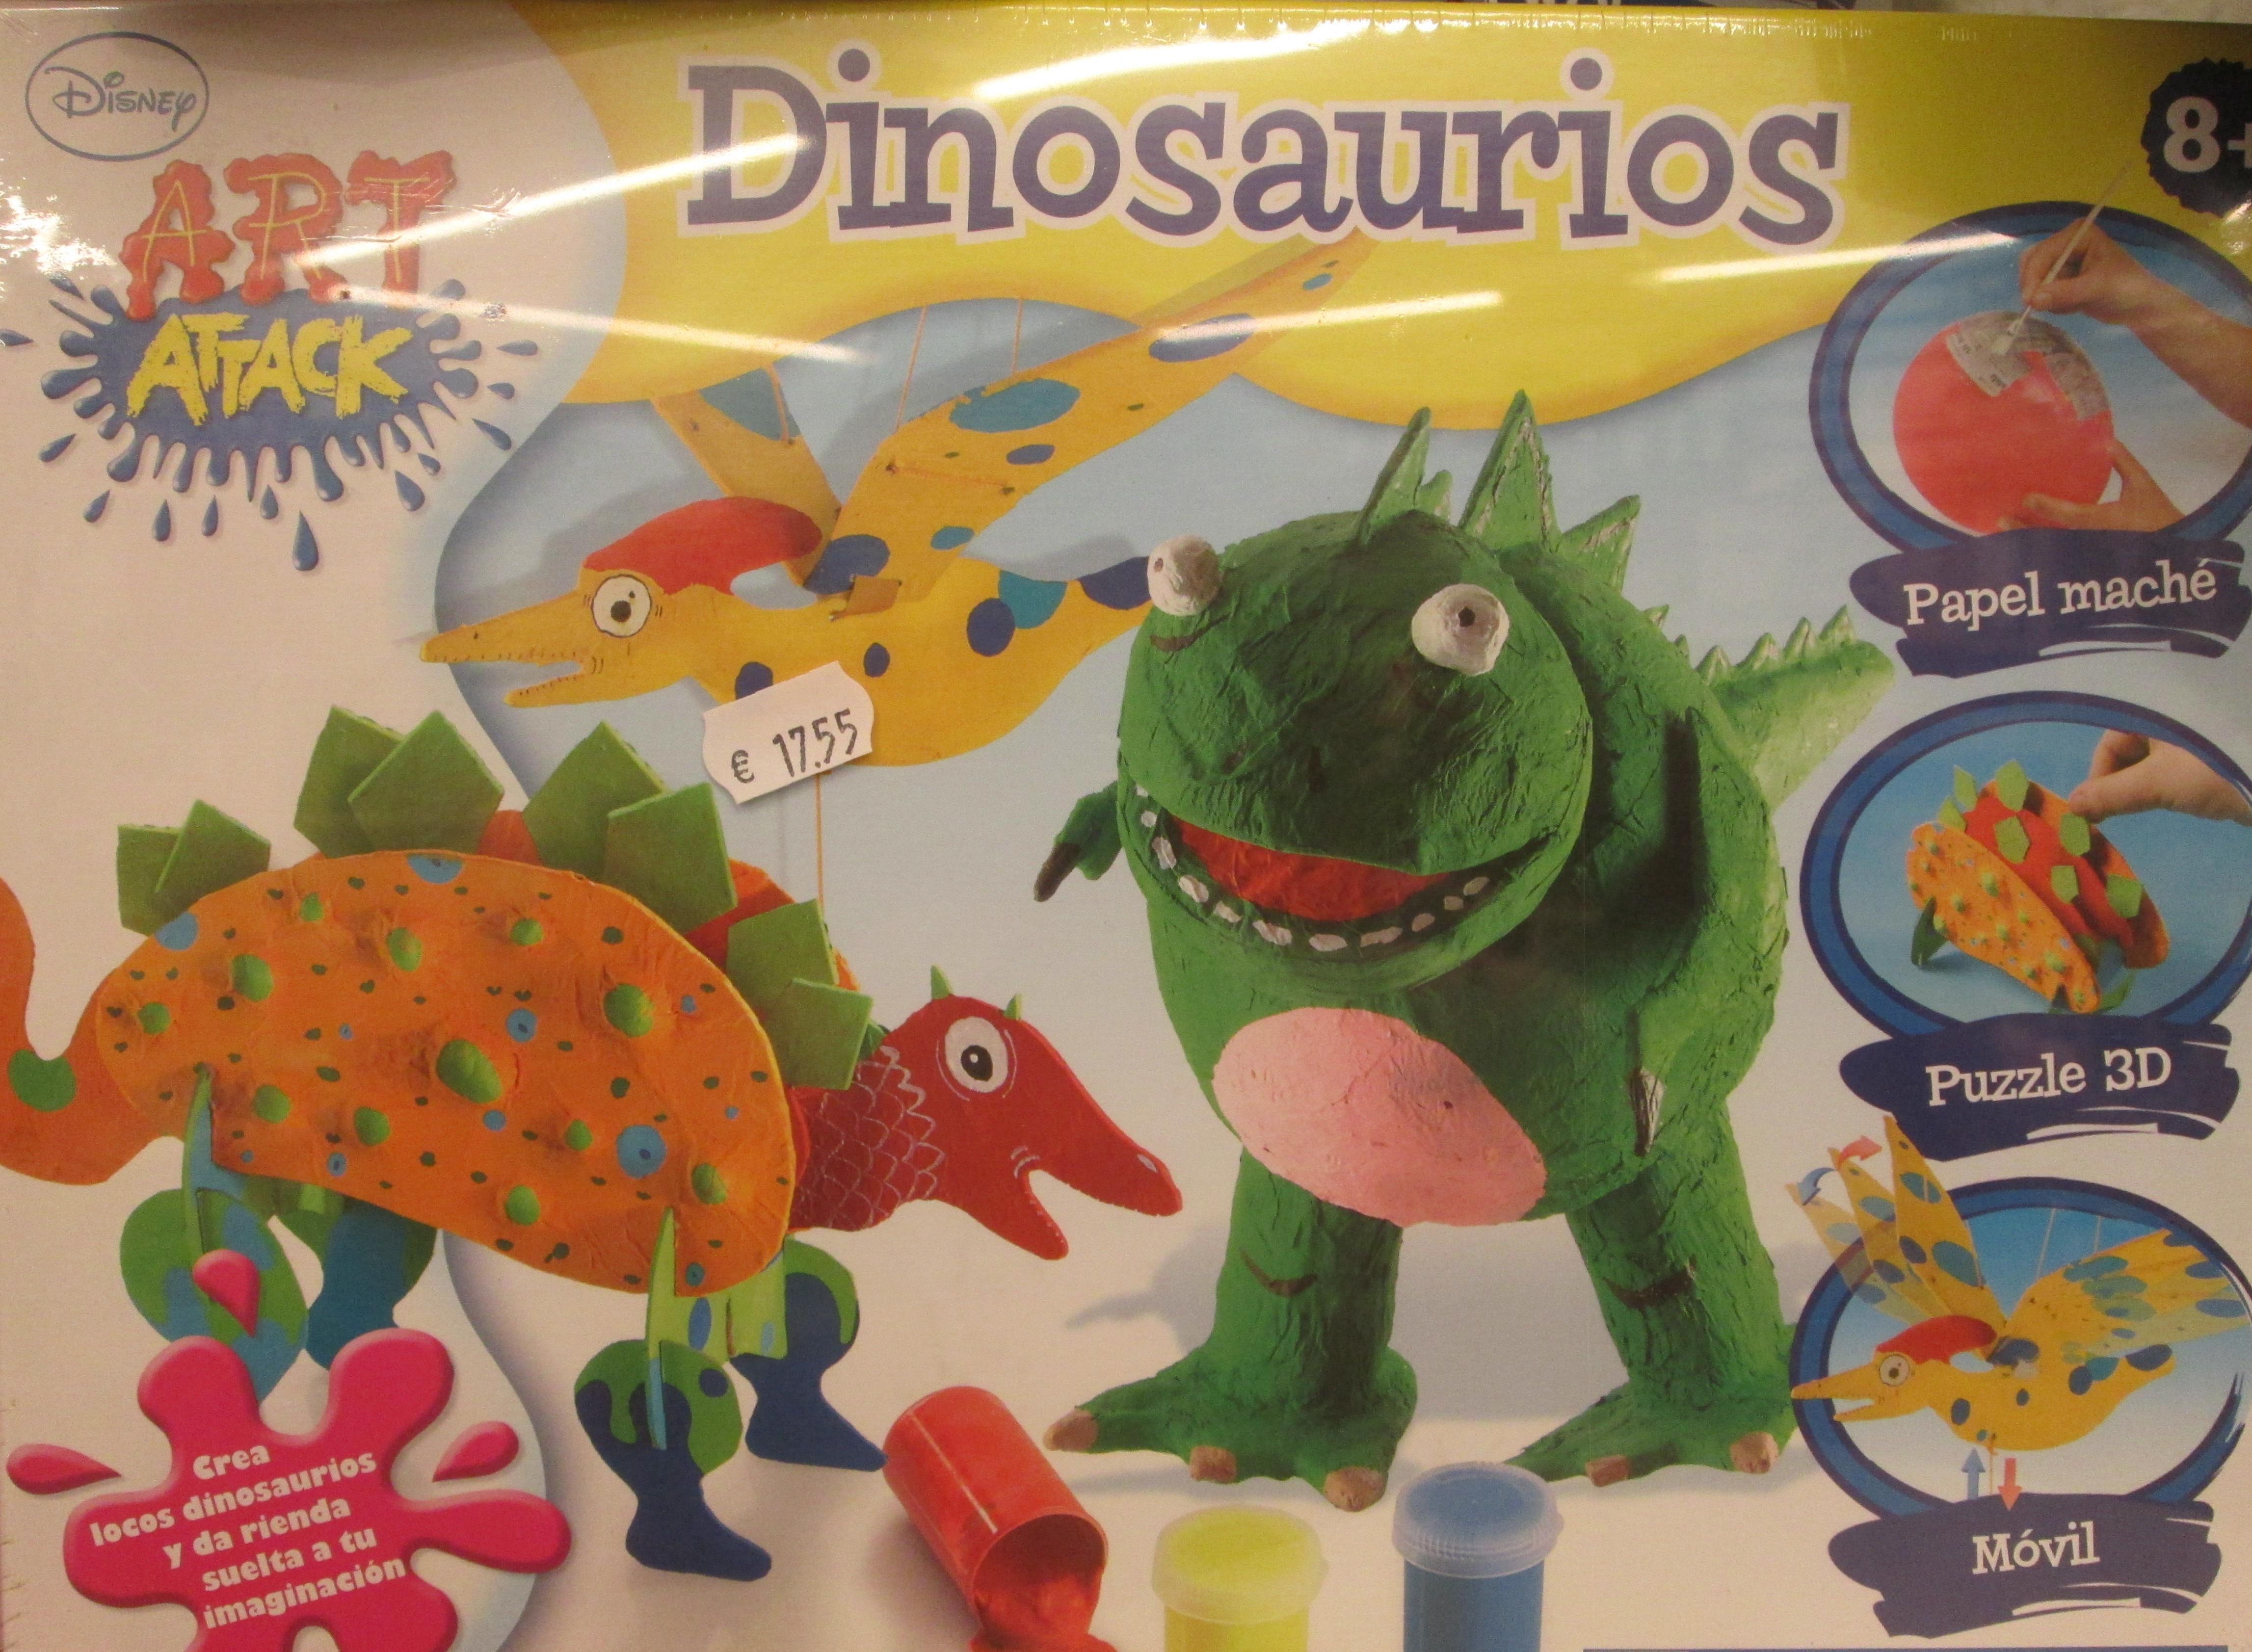 ART ATTAK Dinosaurios